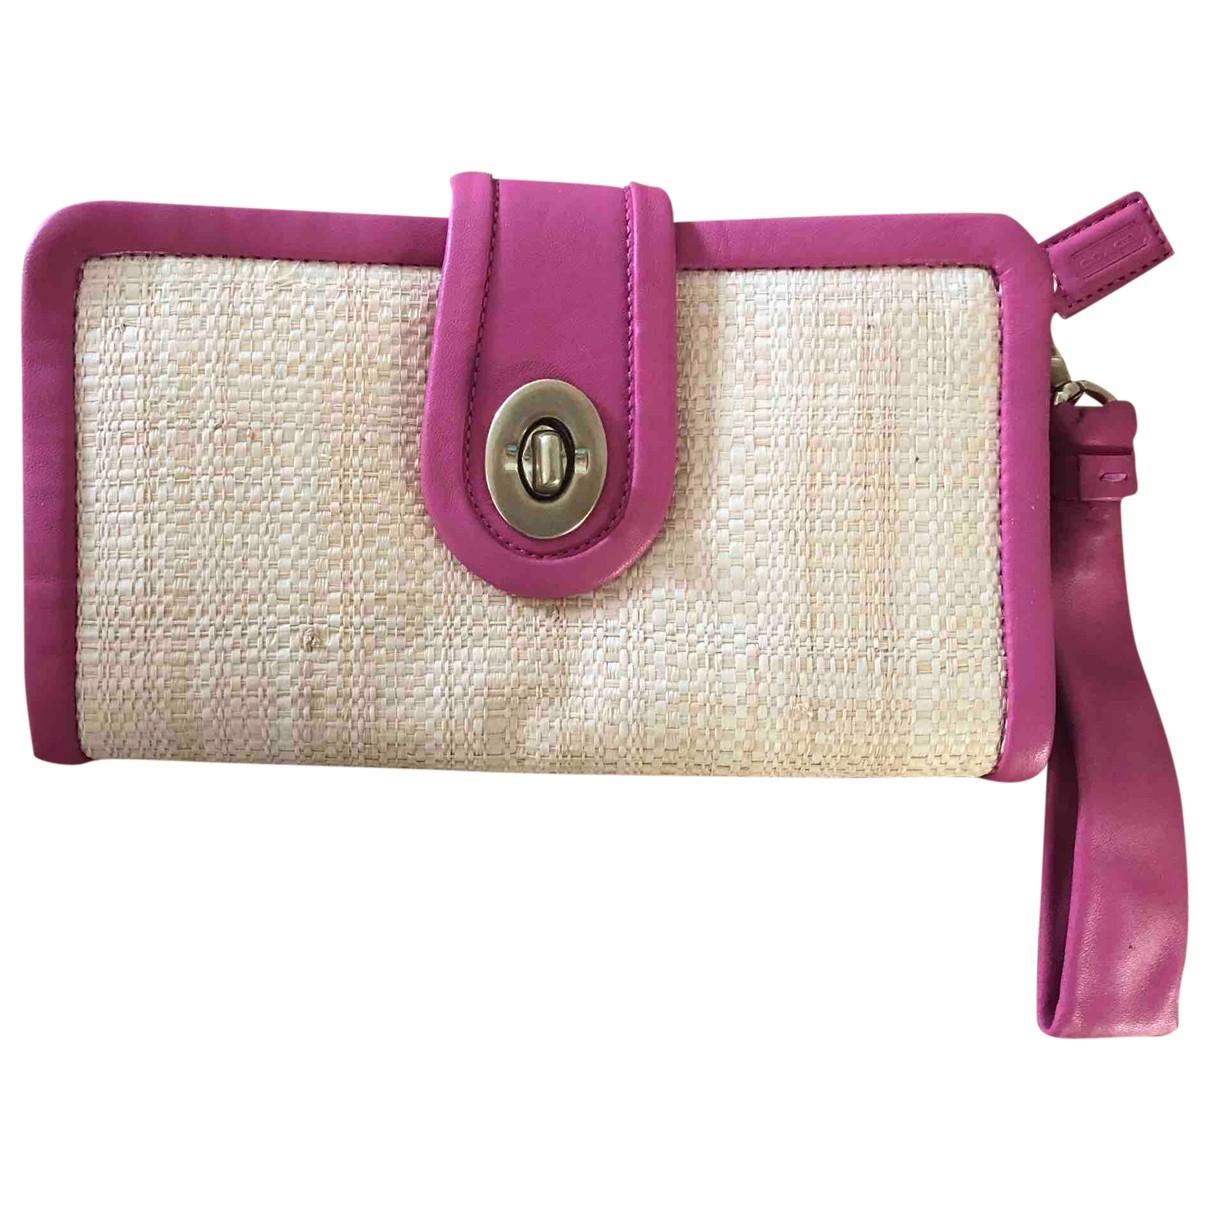 Coach \N Pink Wicker Clutch bag for Women \N